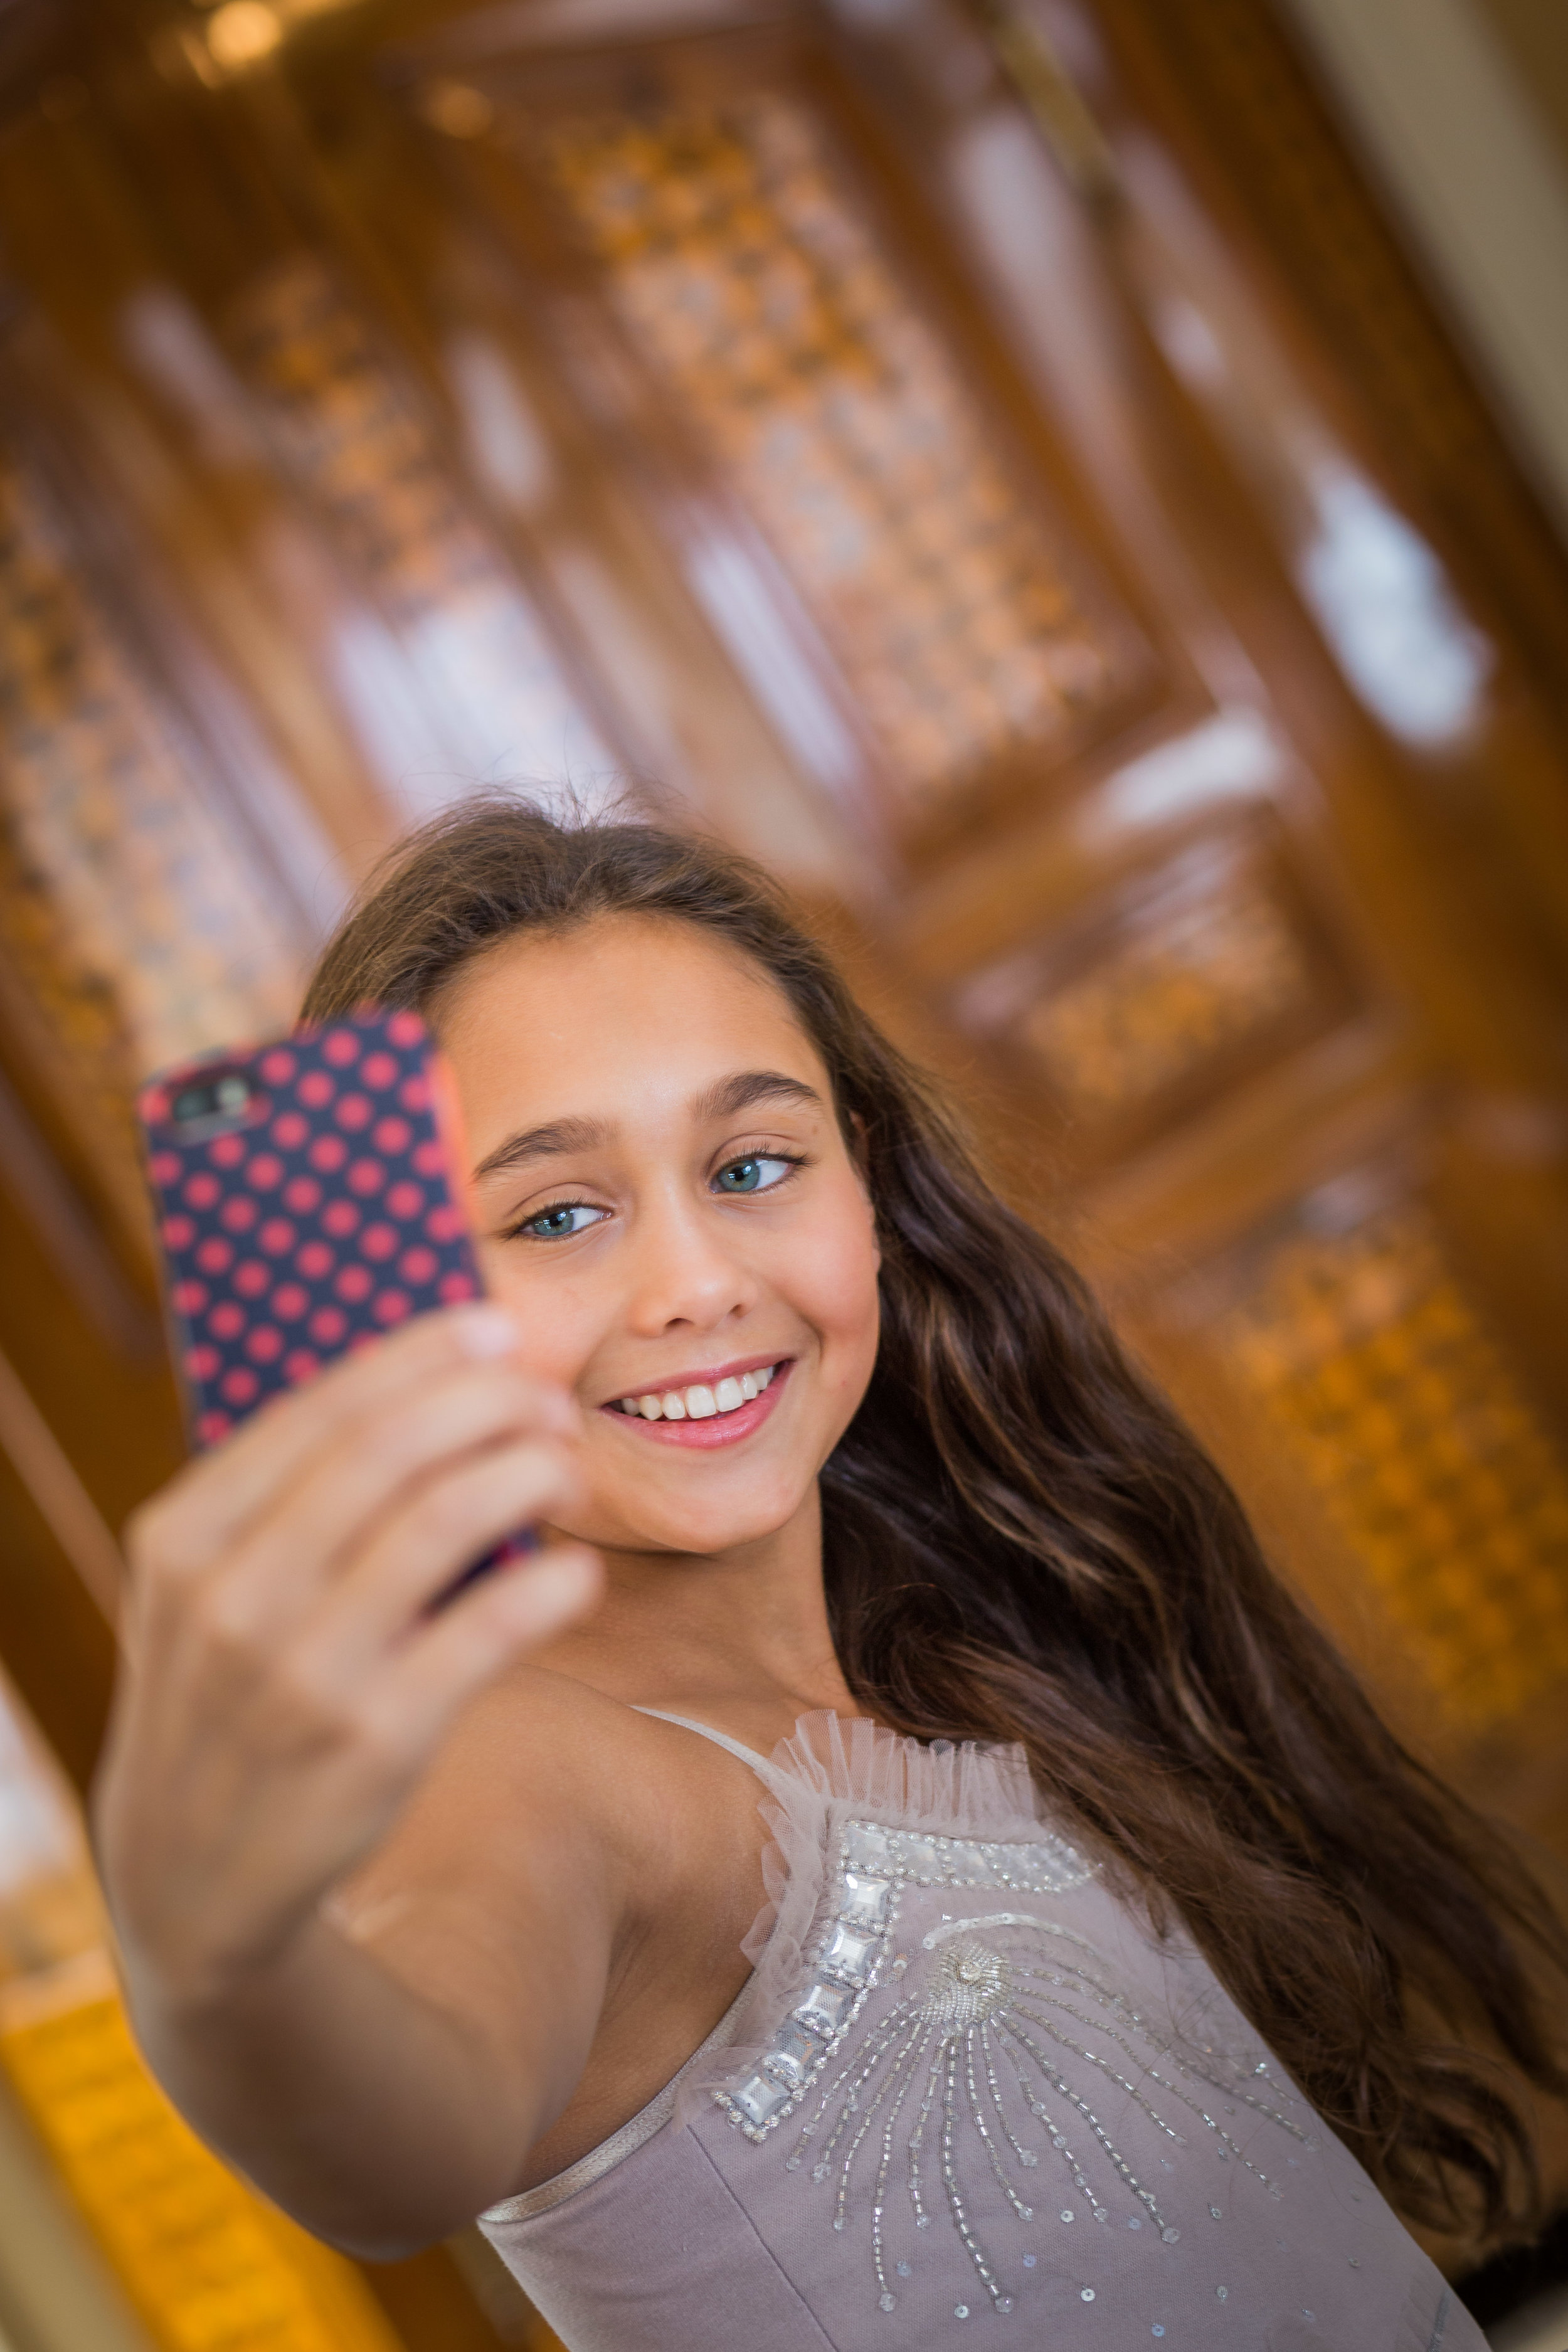 tween portrait of girl taking a selfie